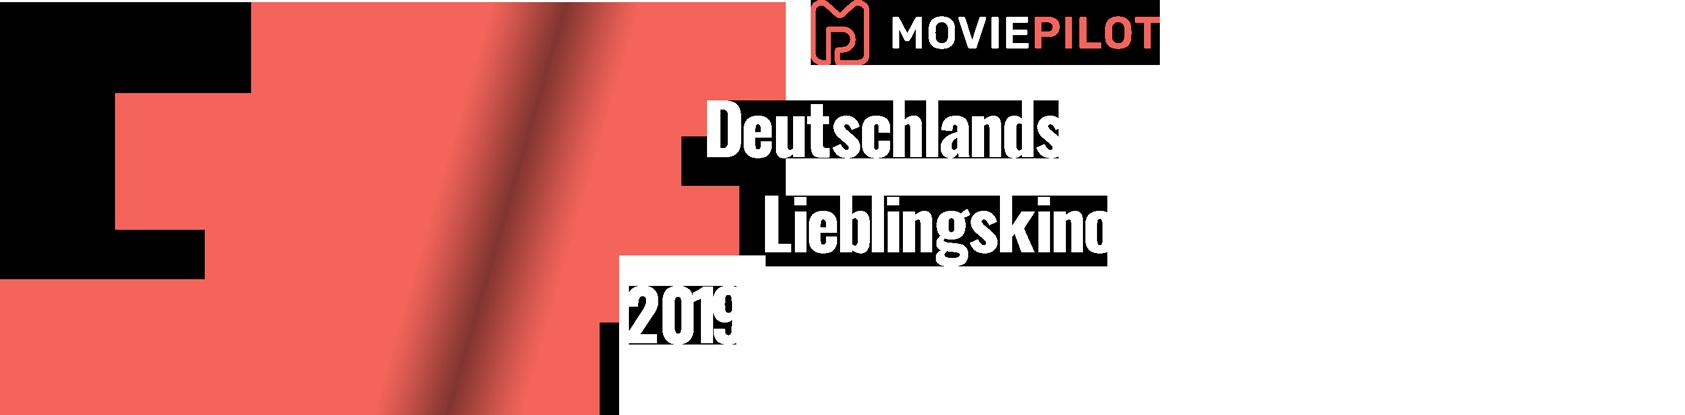 Moviepilot präsentiert Deutschlands Lieblingskino 2019